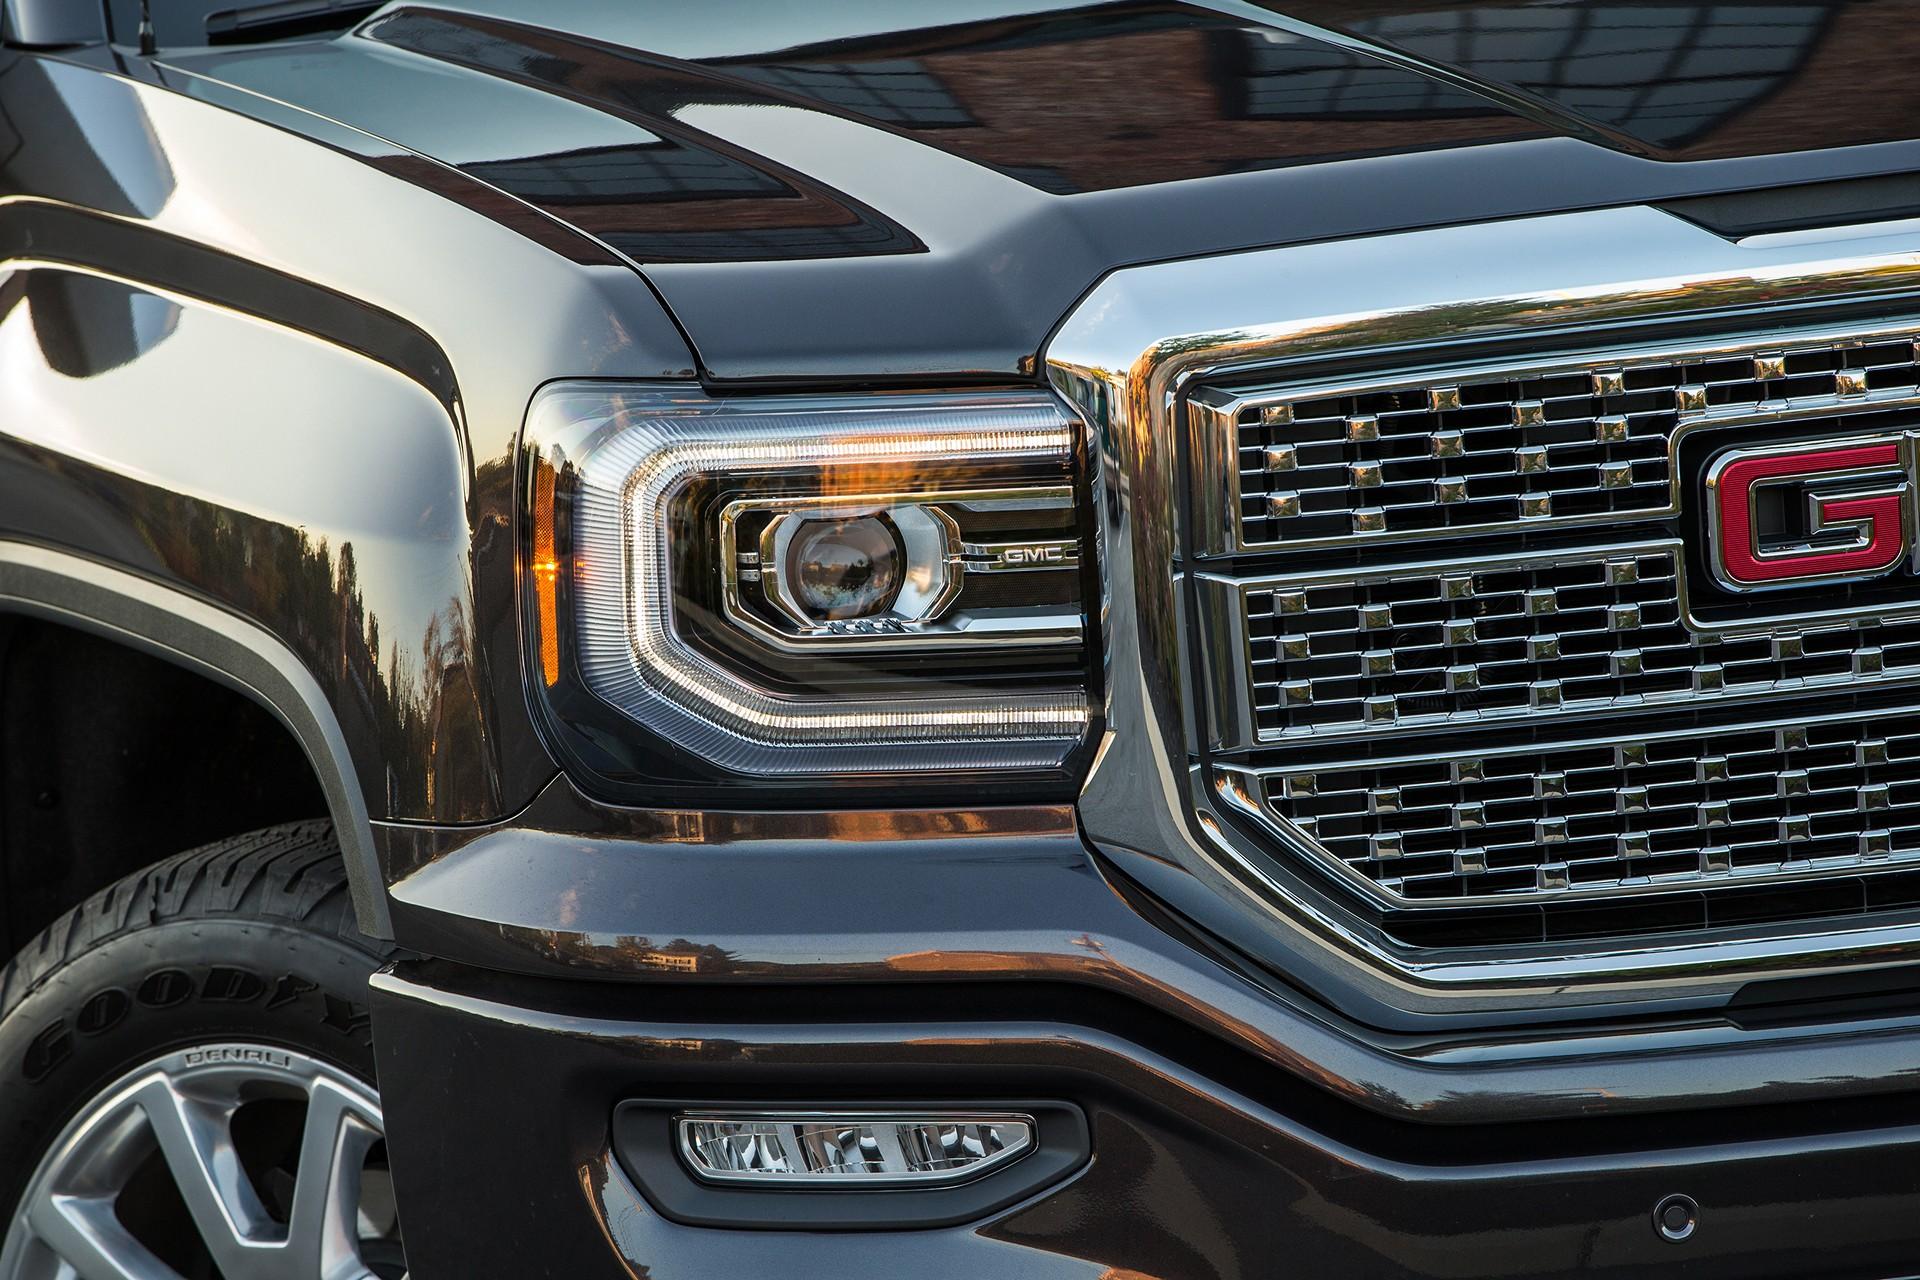 2016 GMC Sierra Denali 1500 © General Motors